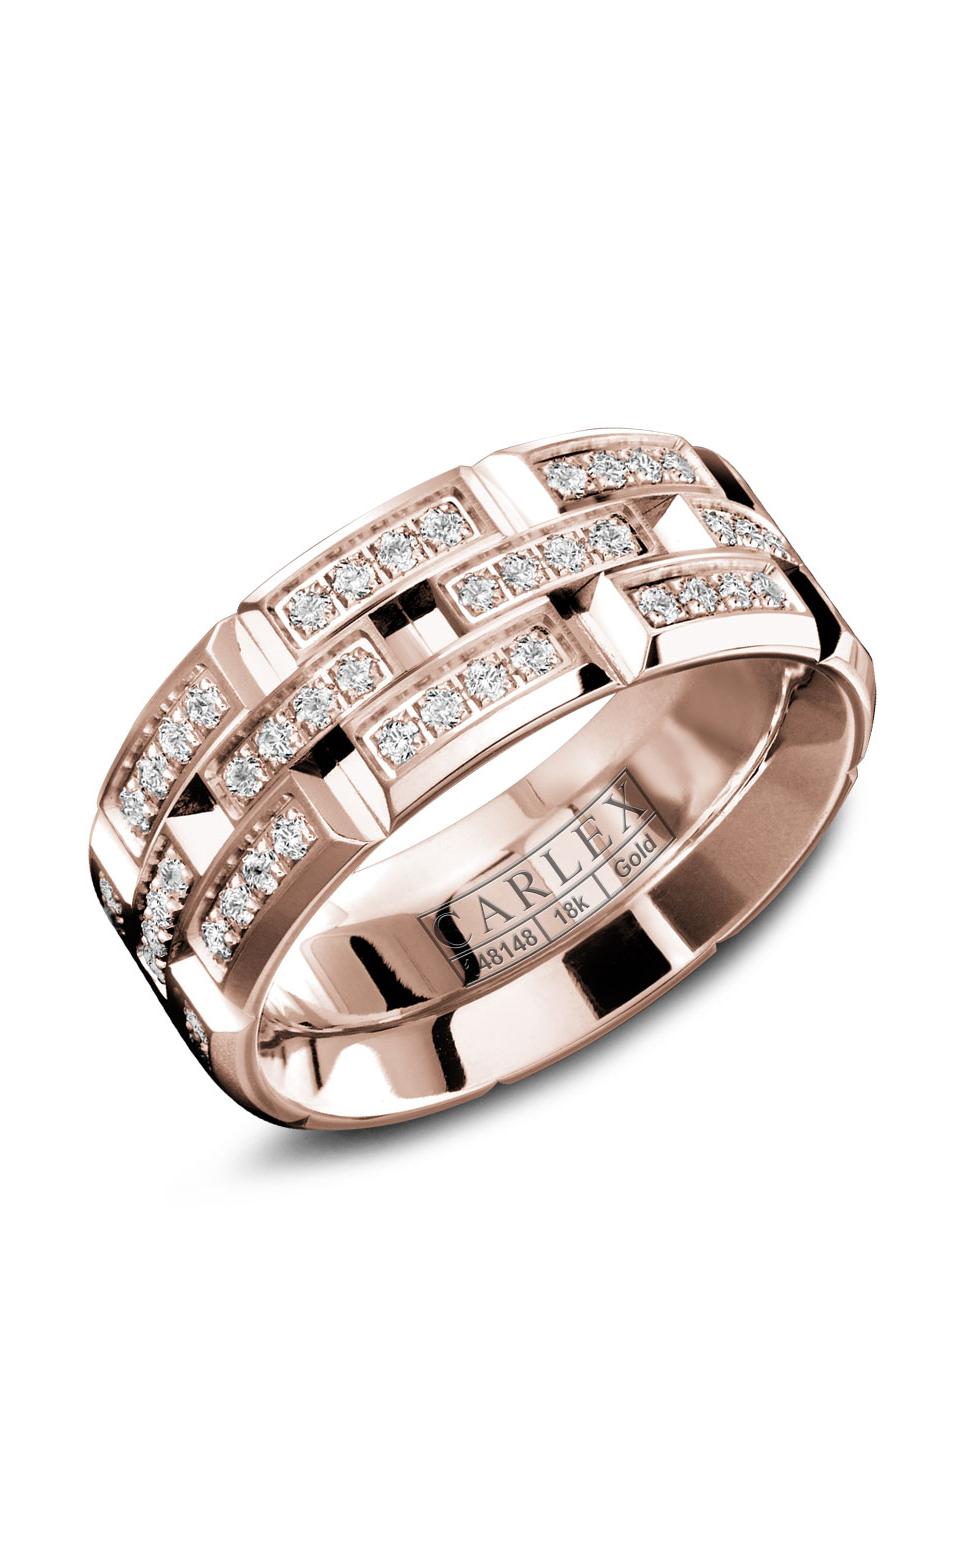 Carlex Men's Wedding Band WB-9318R product image